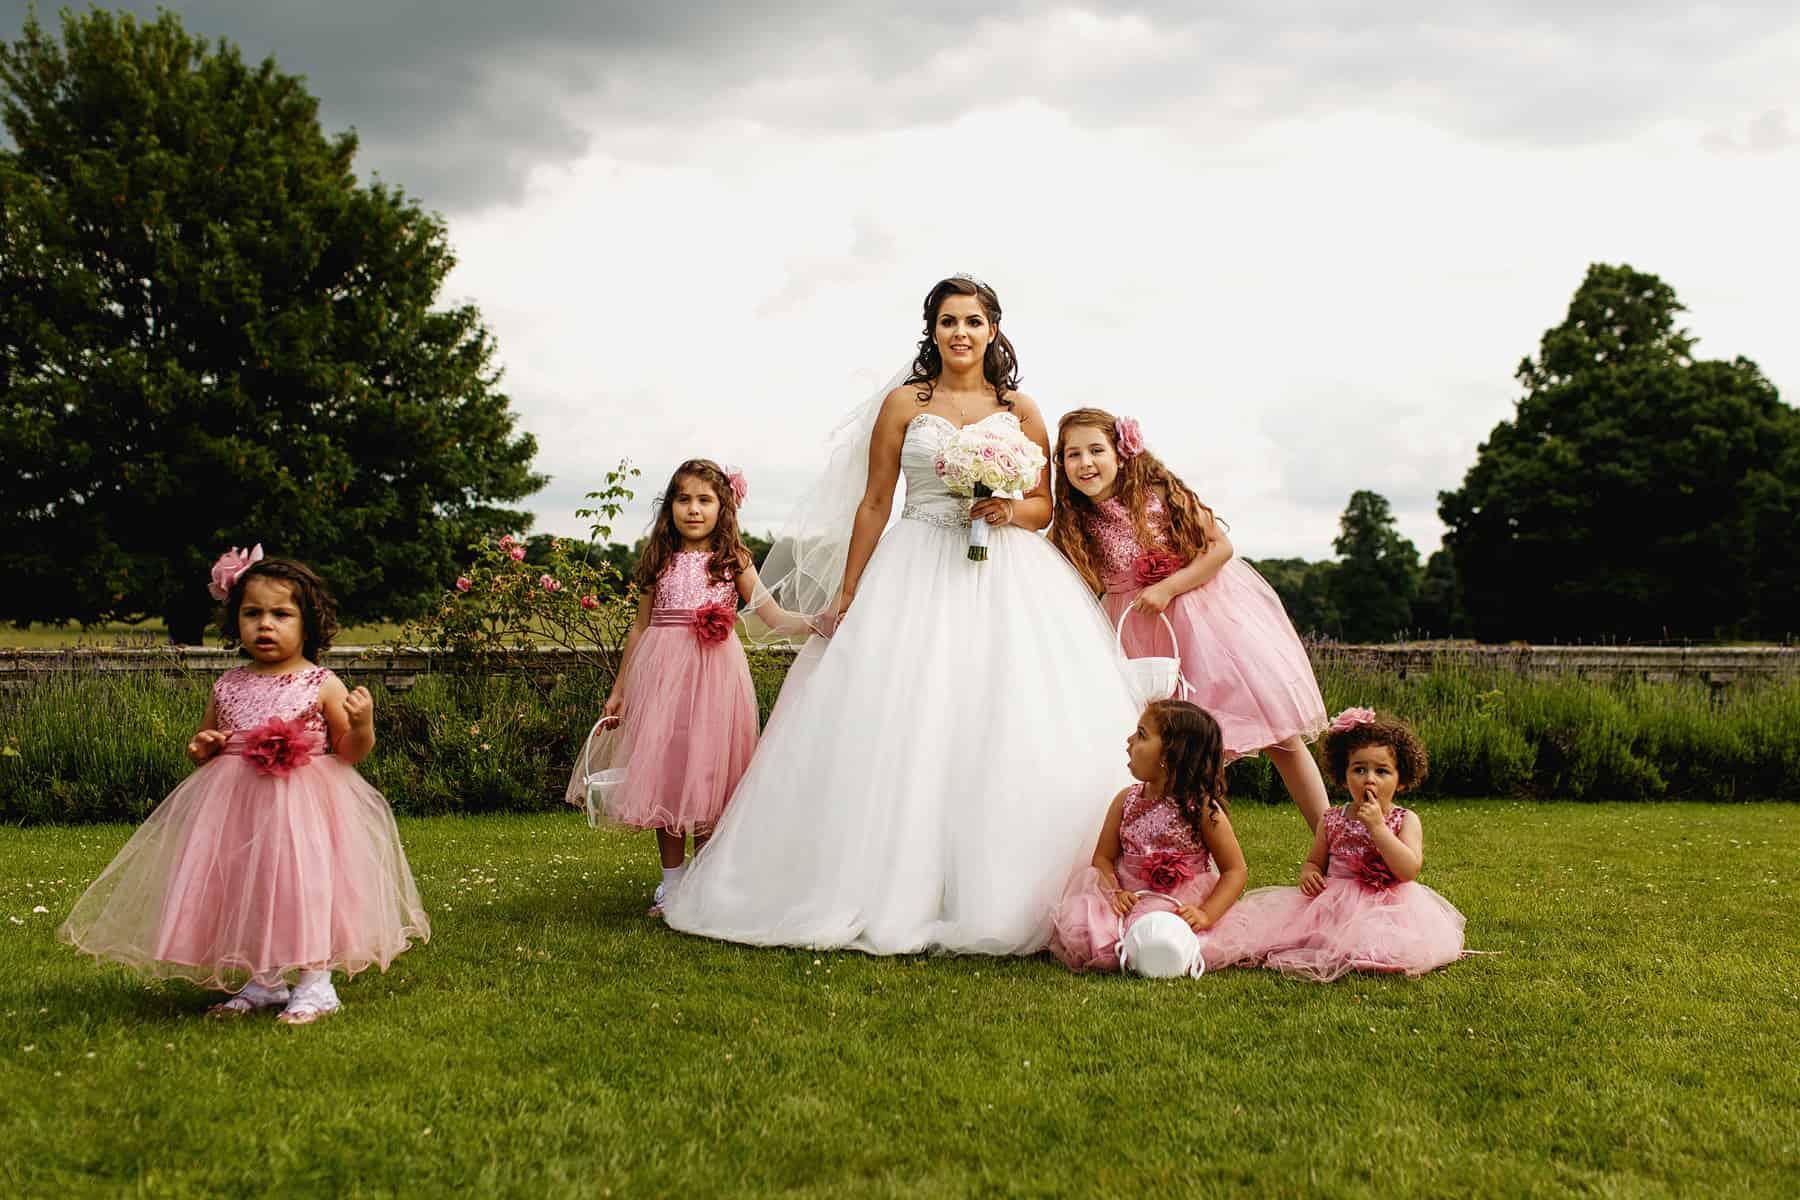 wedding photographer 2016 london best